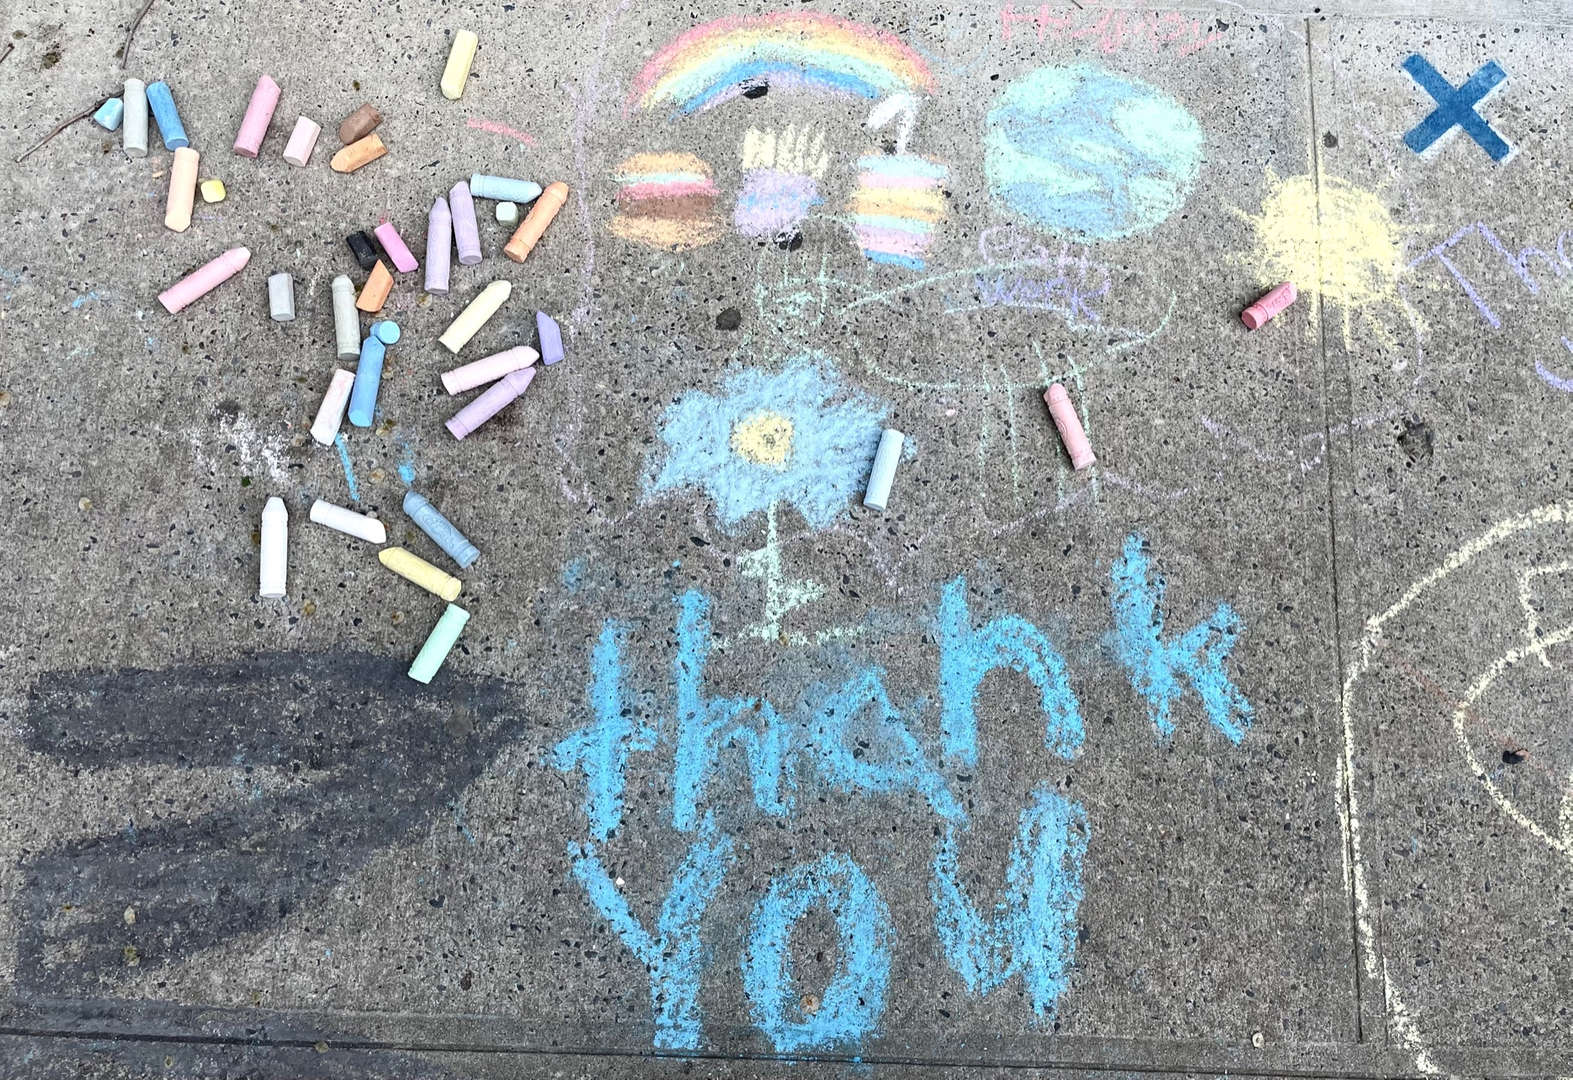 Thank you teachers message in chalk on sidewalk